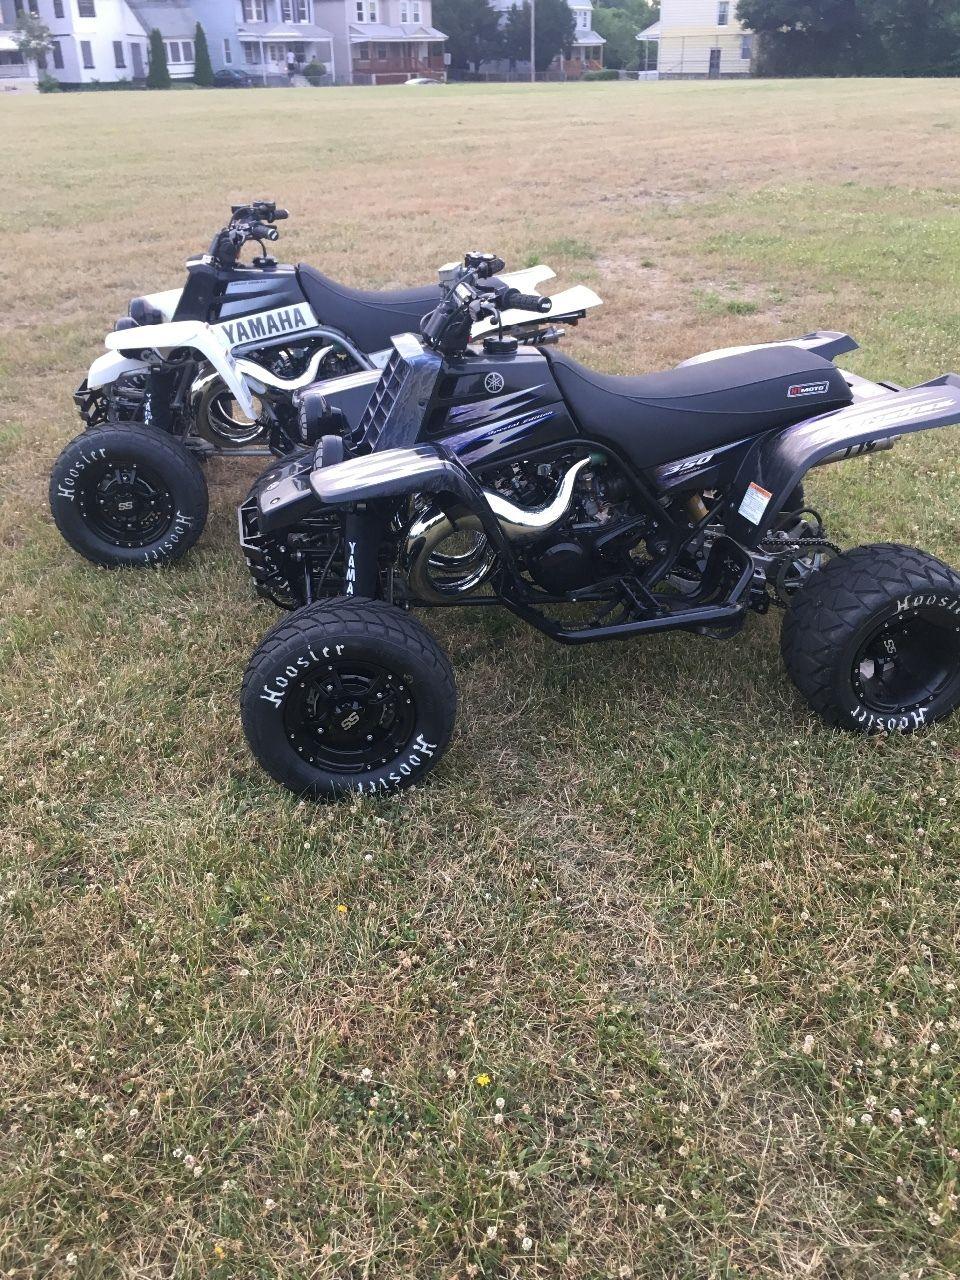 Used 2001 Yamaha BANSHEE 350 ATVs For Sale in Ohio. 2001 ...